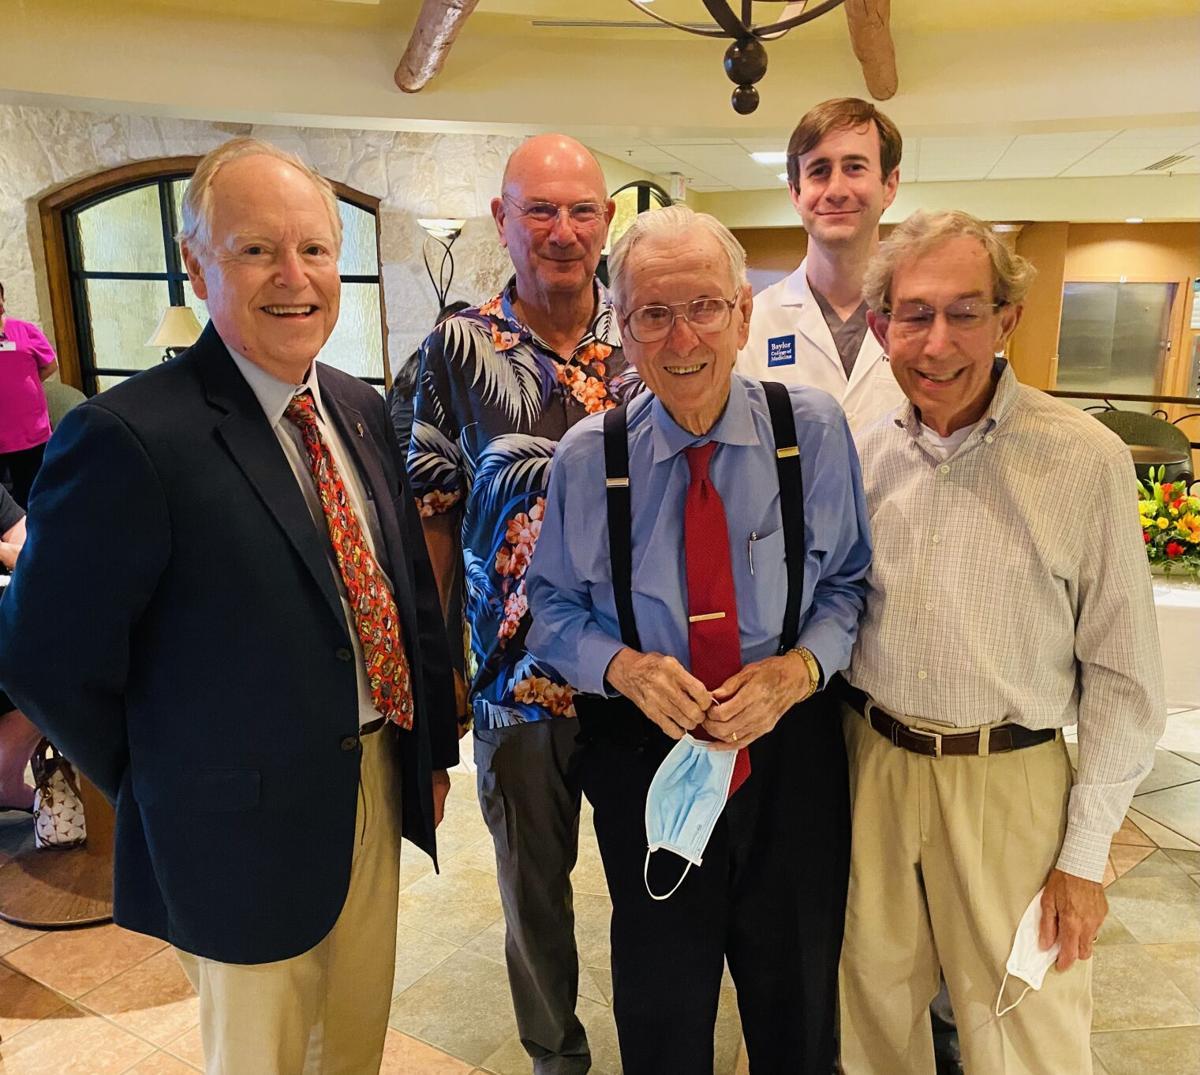 Surprise party for Dr. Larry Riedel